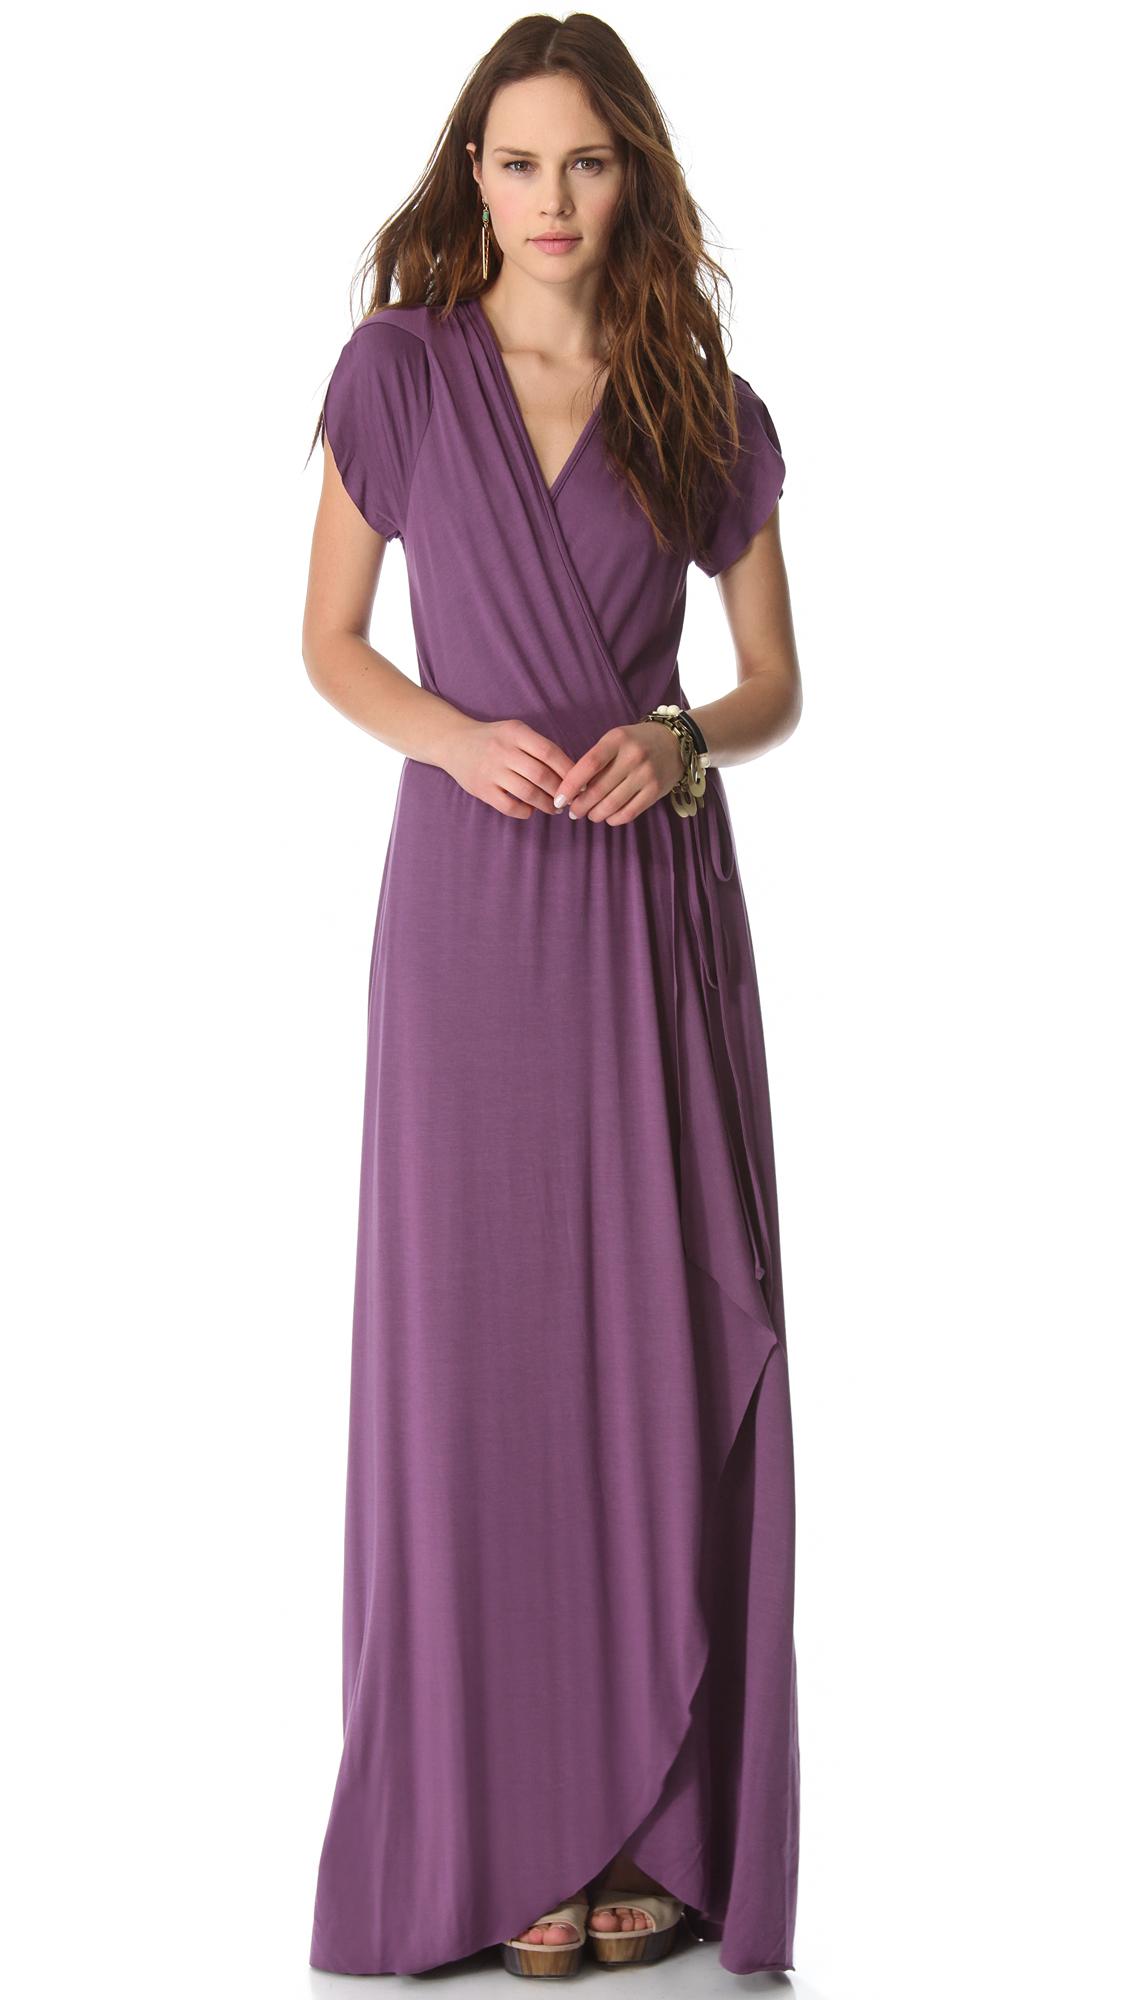 Rachel Pally Perpetua Maxi Dress - SHOPBOP